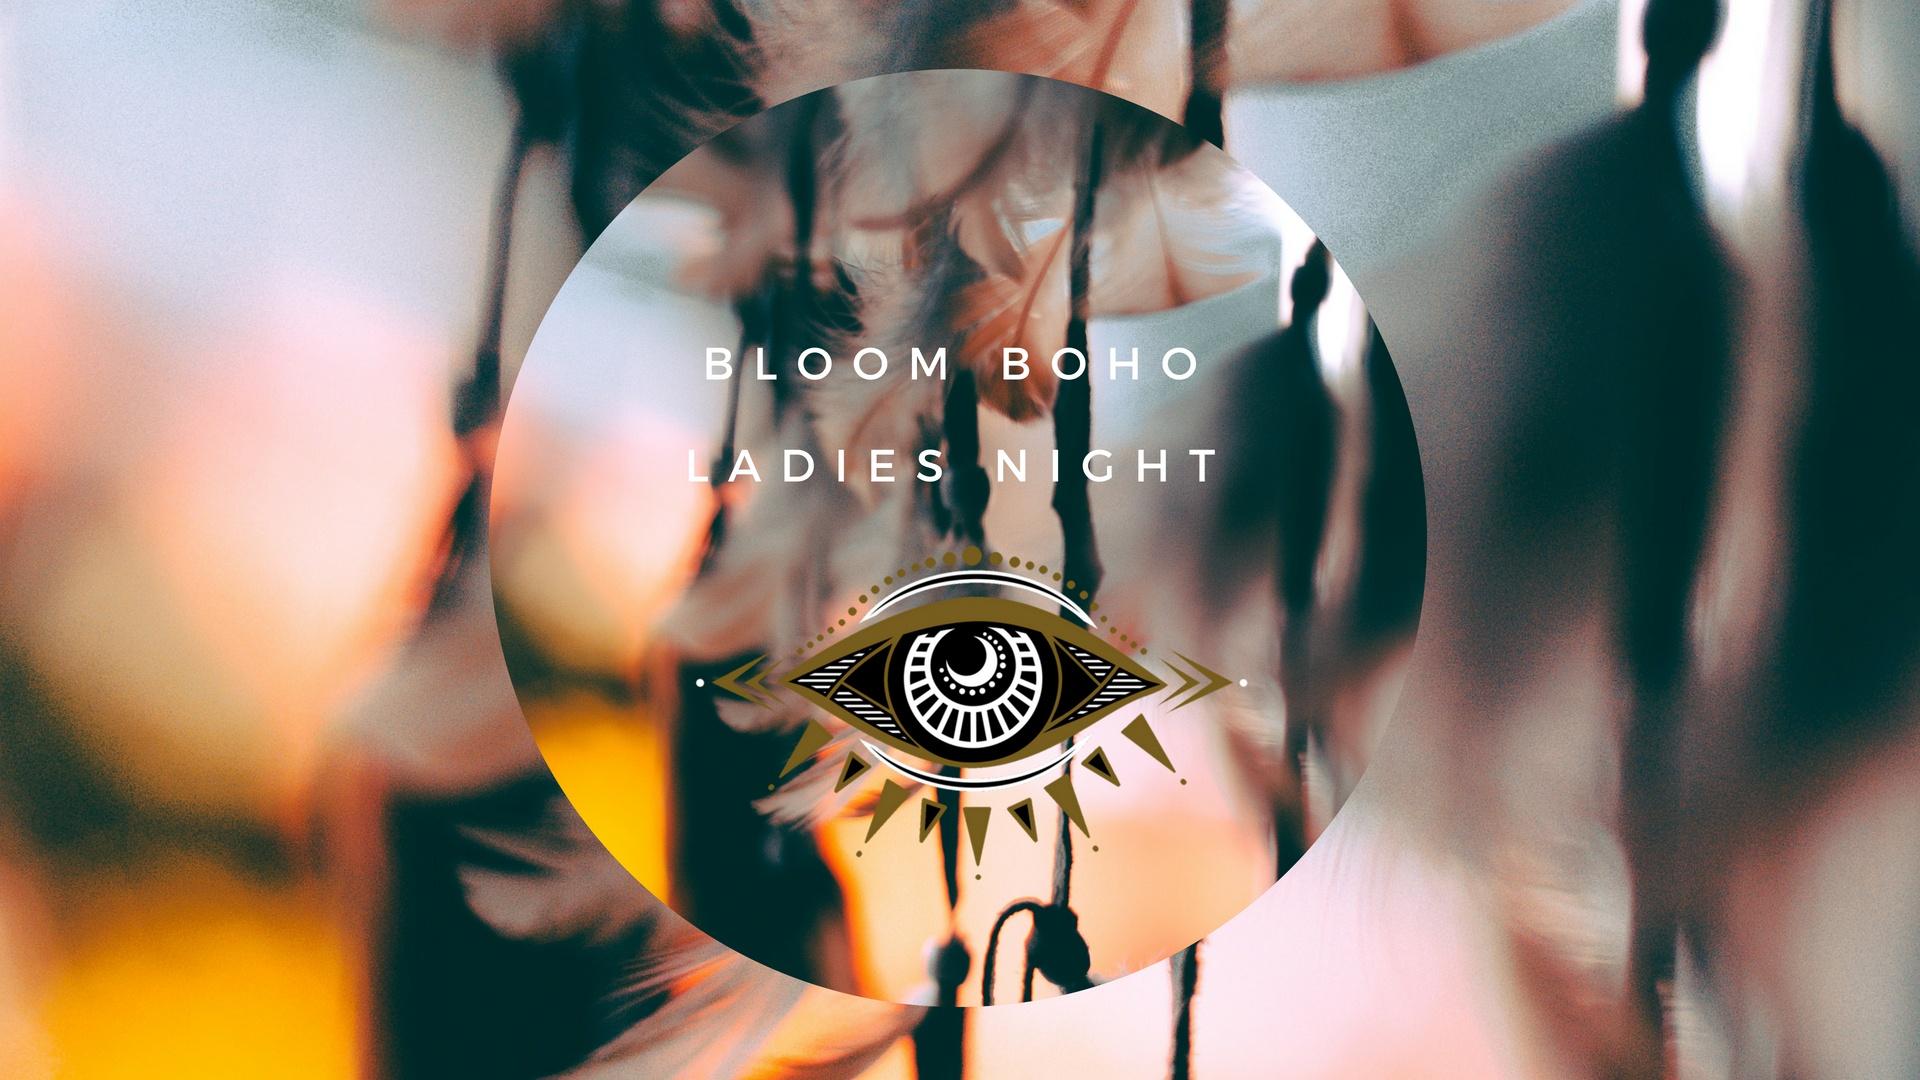 boho ladies night bloom pop up fundraiser